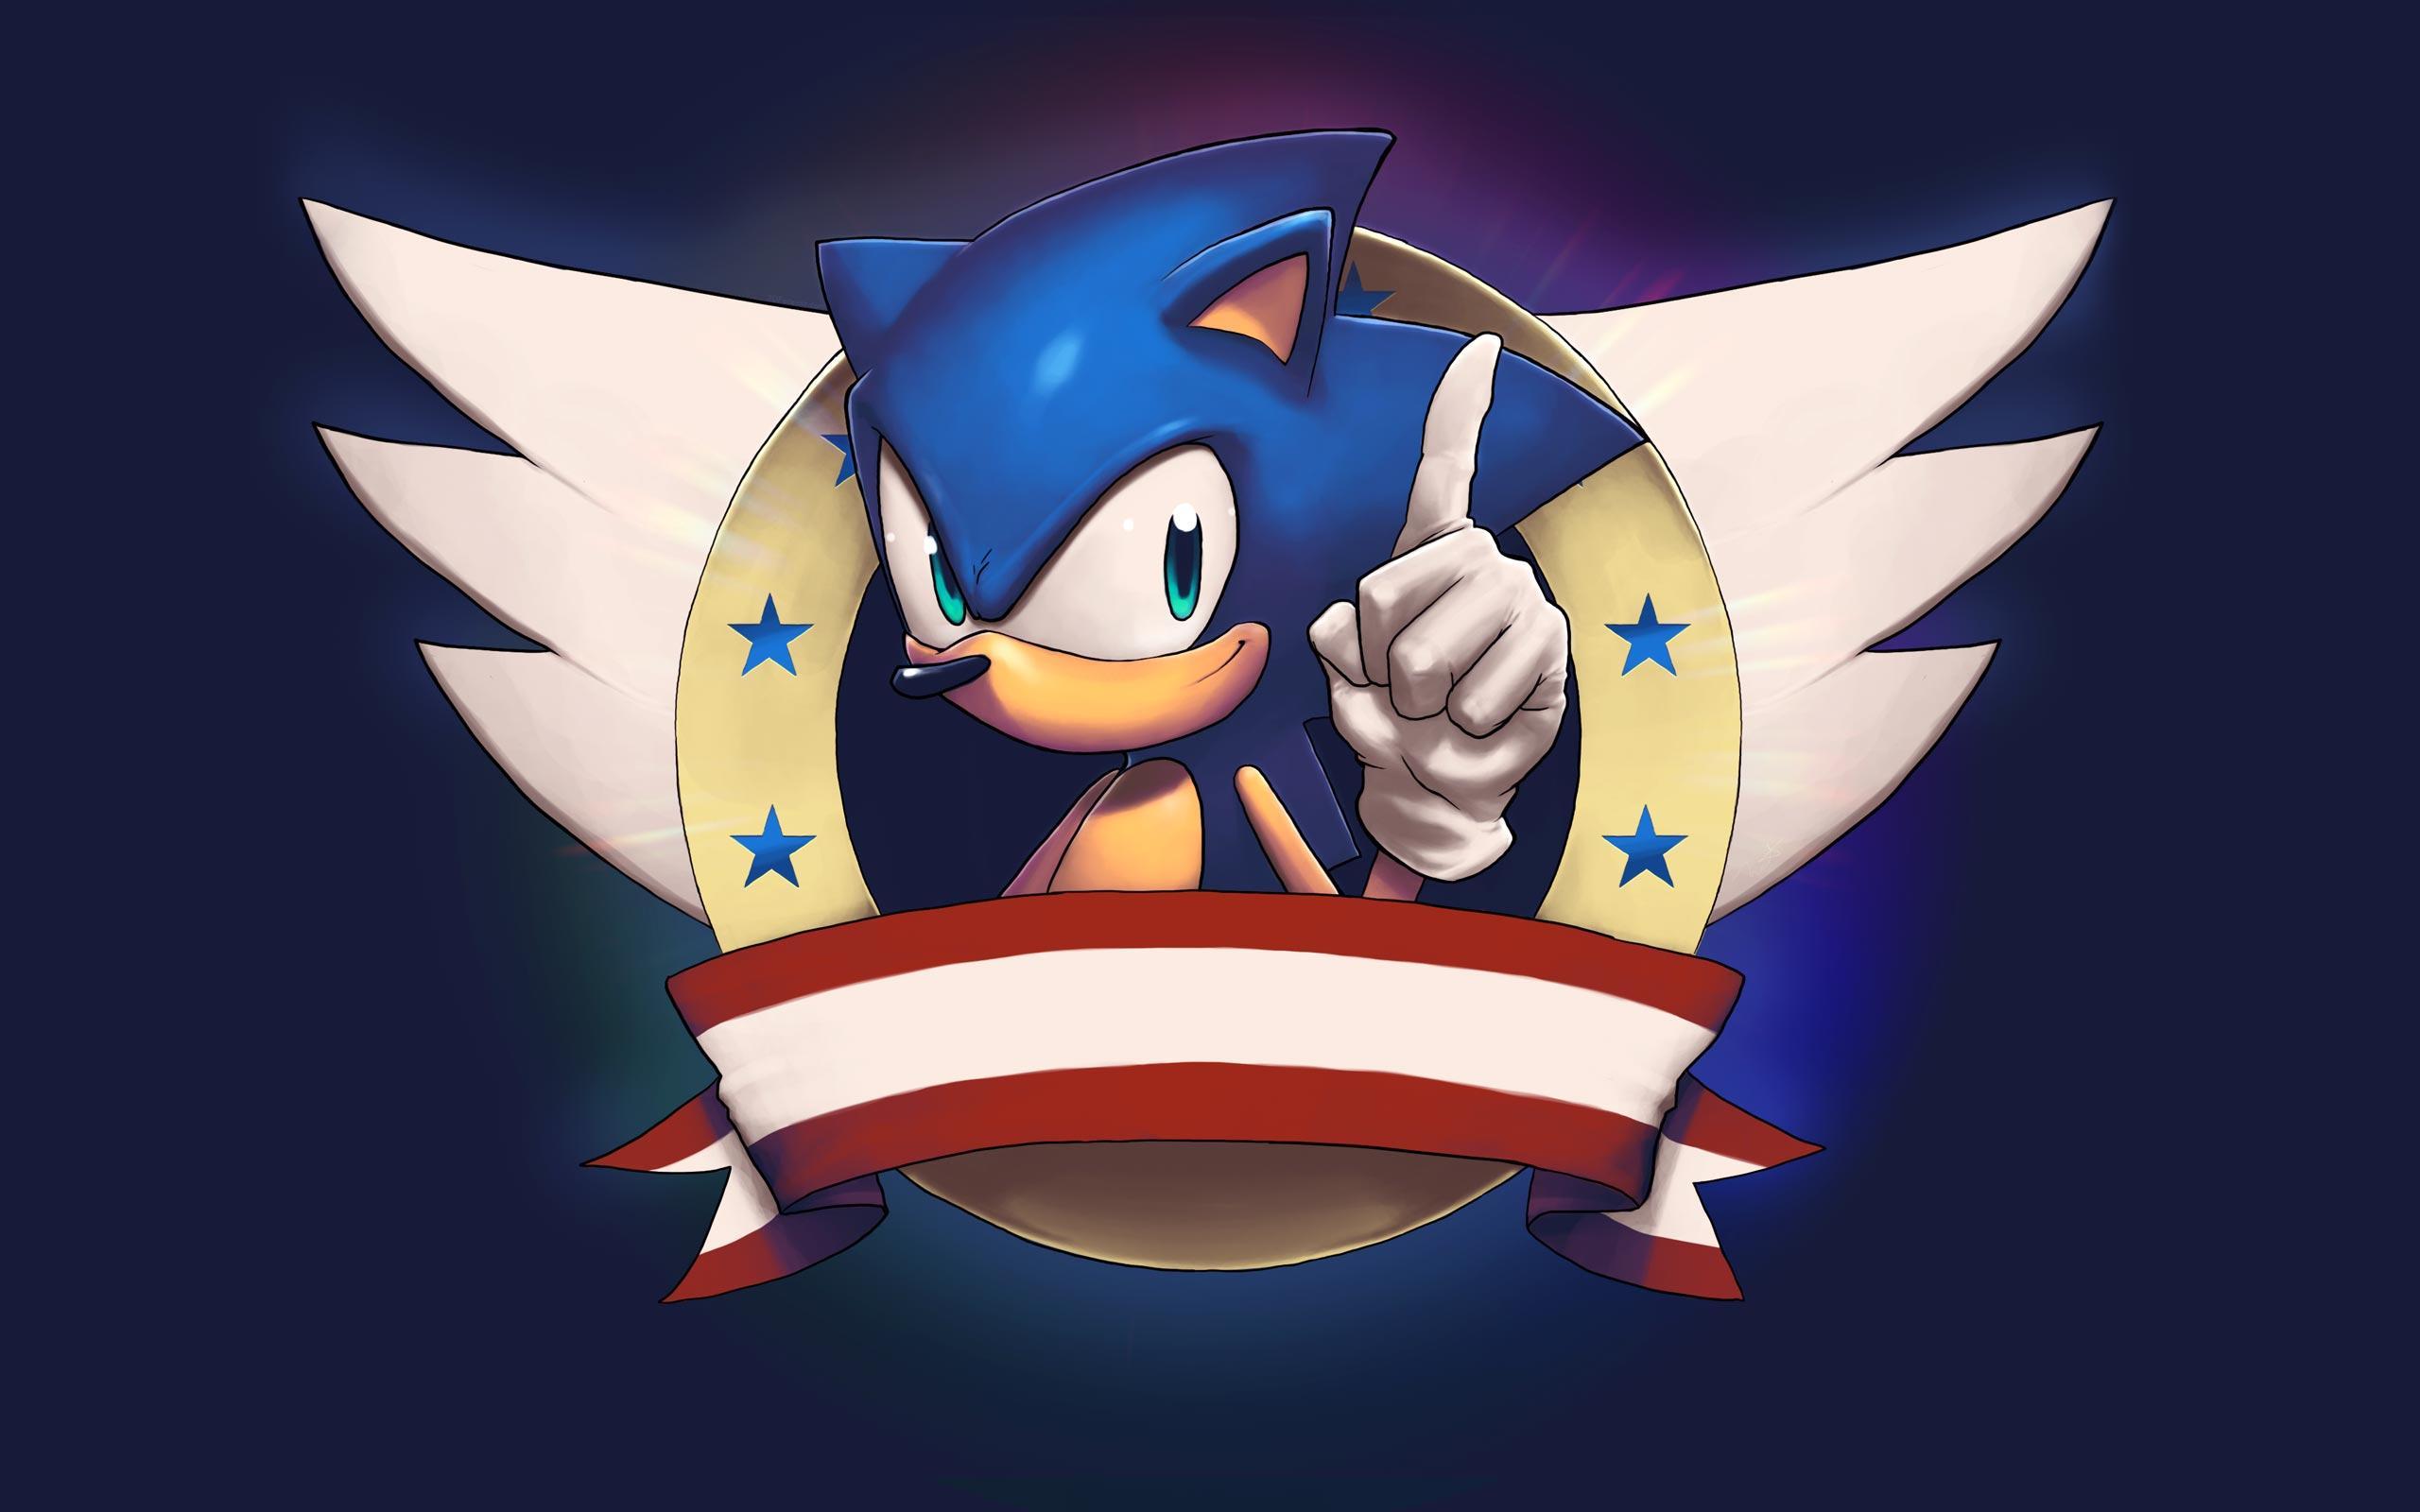 Sonic The Hedgehog Wallpaper